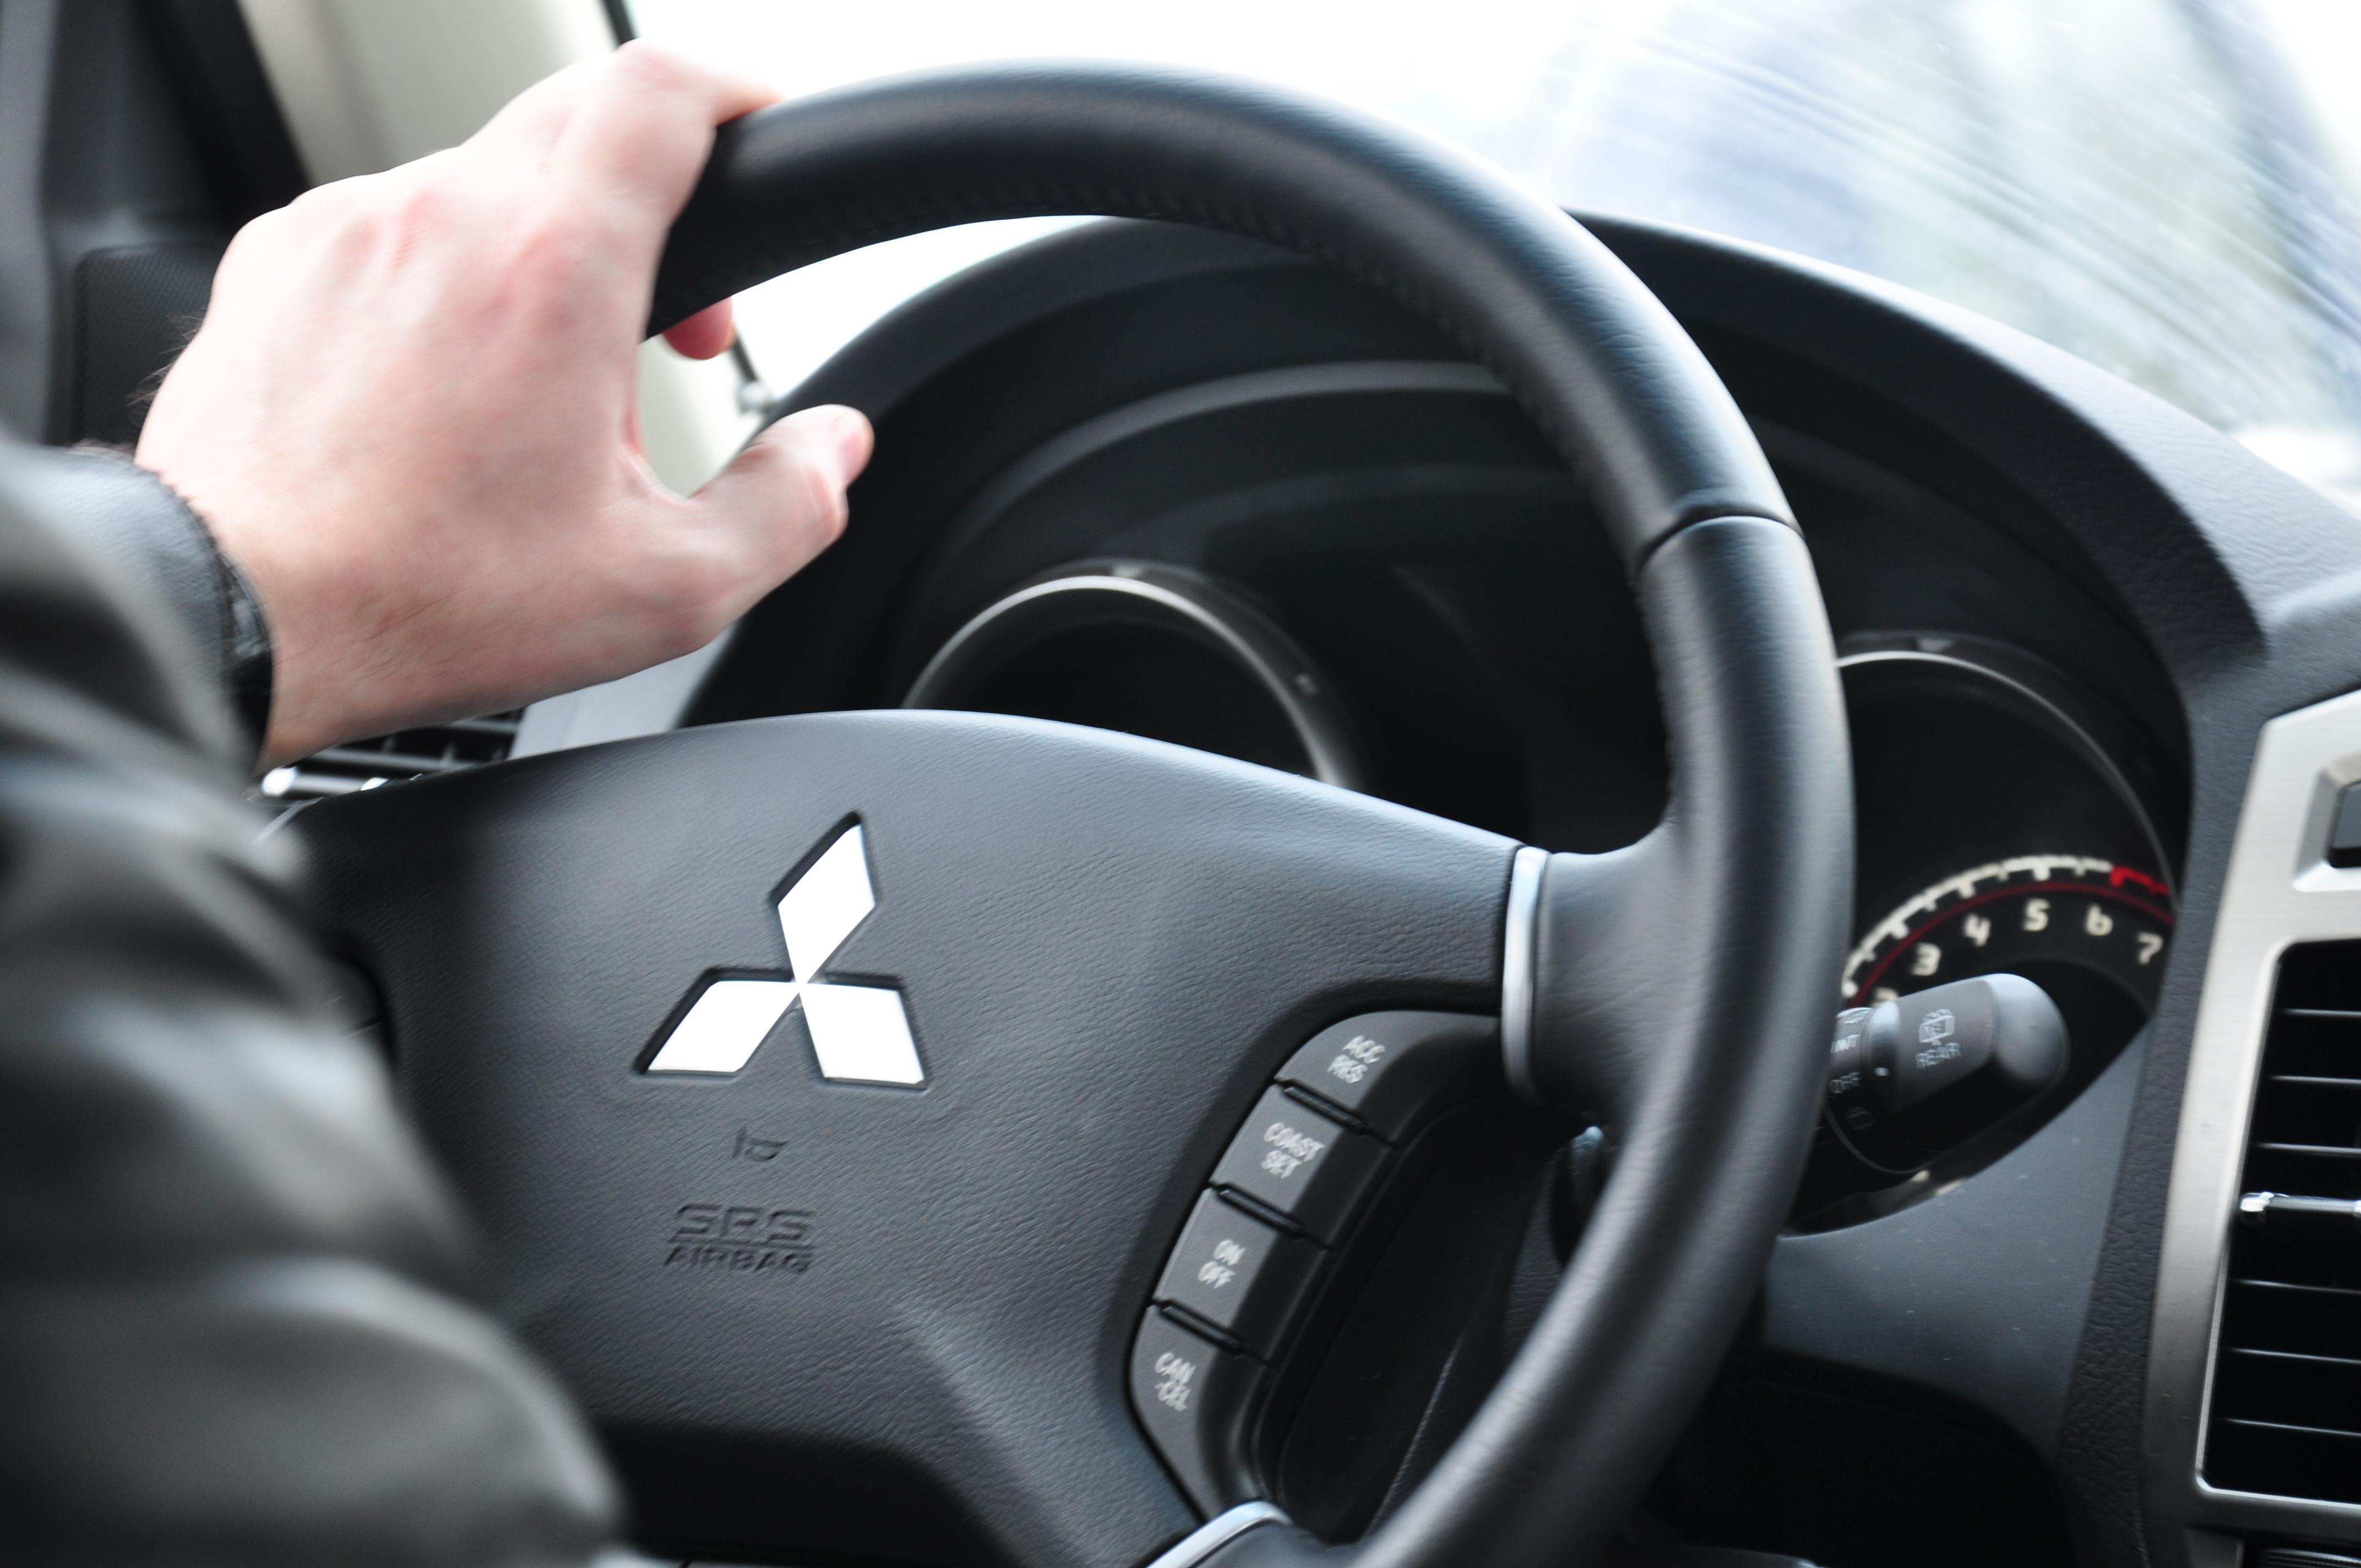 Антикризисное предложение от автосалона Динамика дилерского центра Mitsubishi.